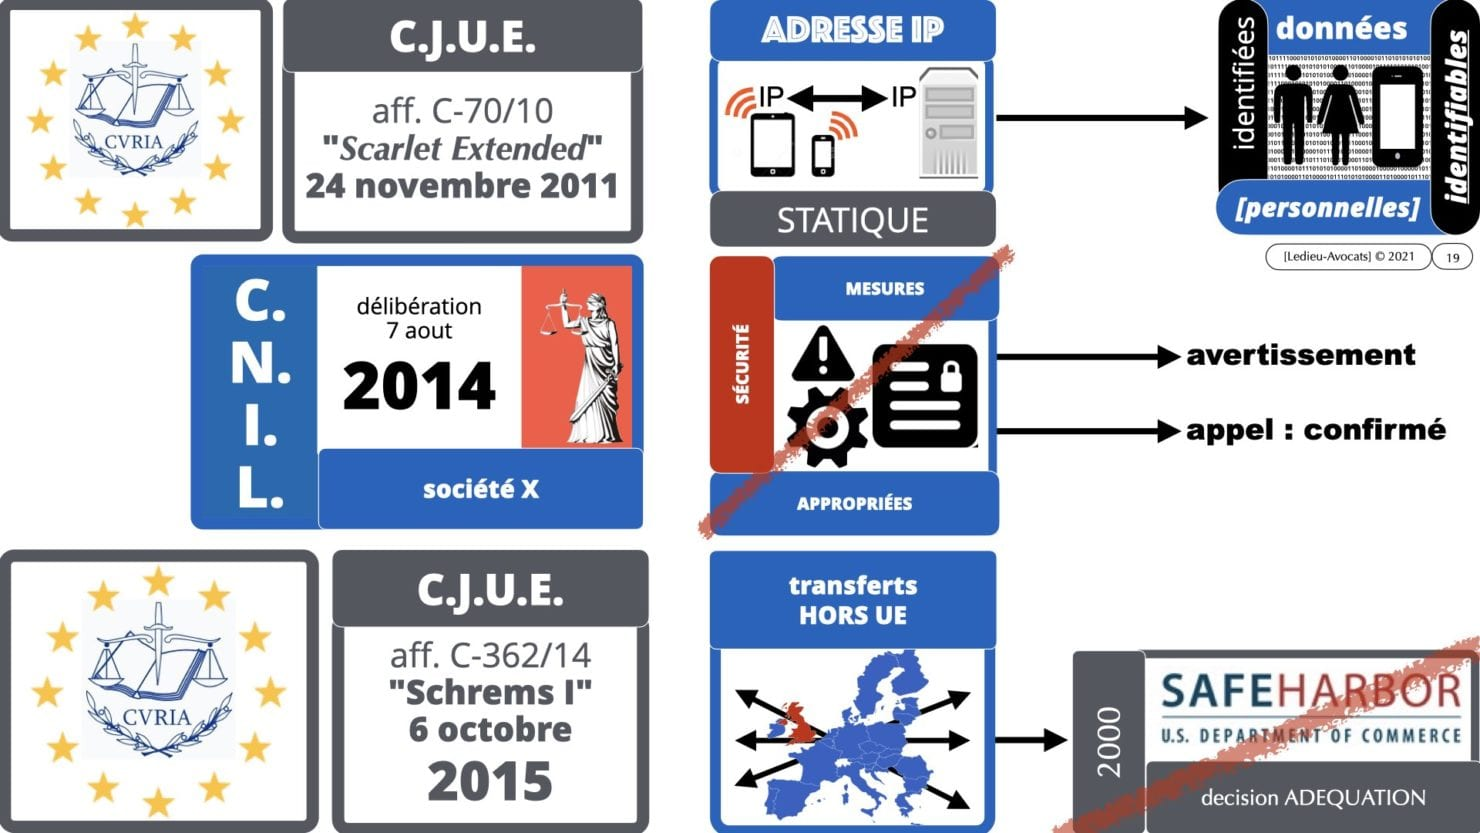 RGPD e-Privacy principes actualité jurisprudence ©Ledieu-Avocats 25-06-2021.019